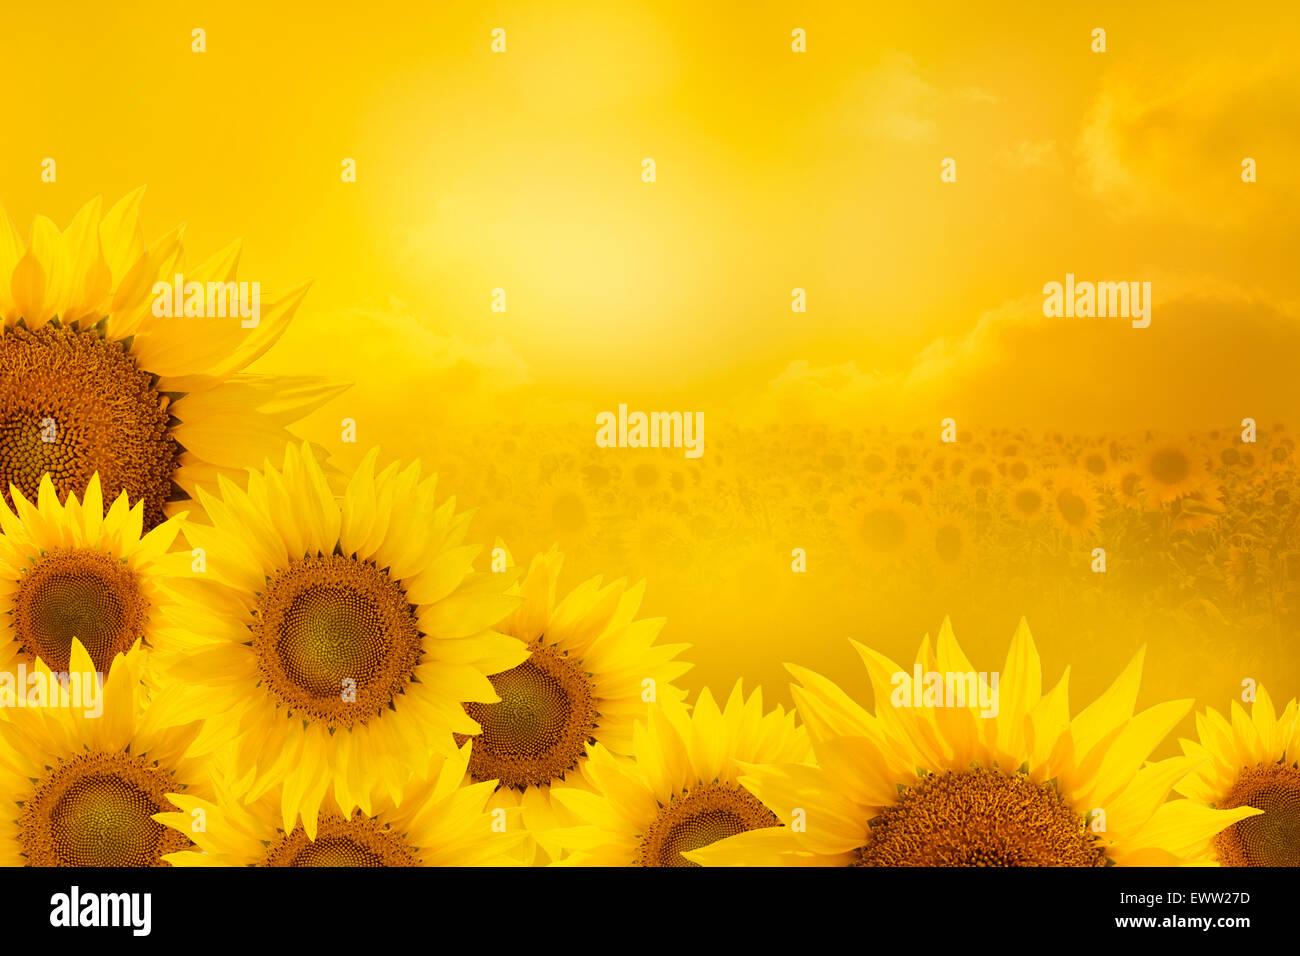 Flower Border Clip Art Stockfotos & Flower Border Clip Art Bilder ...